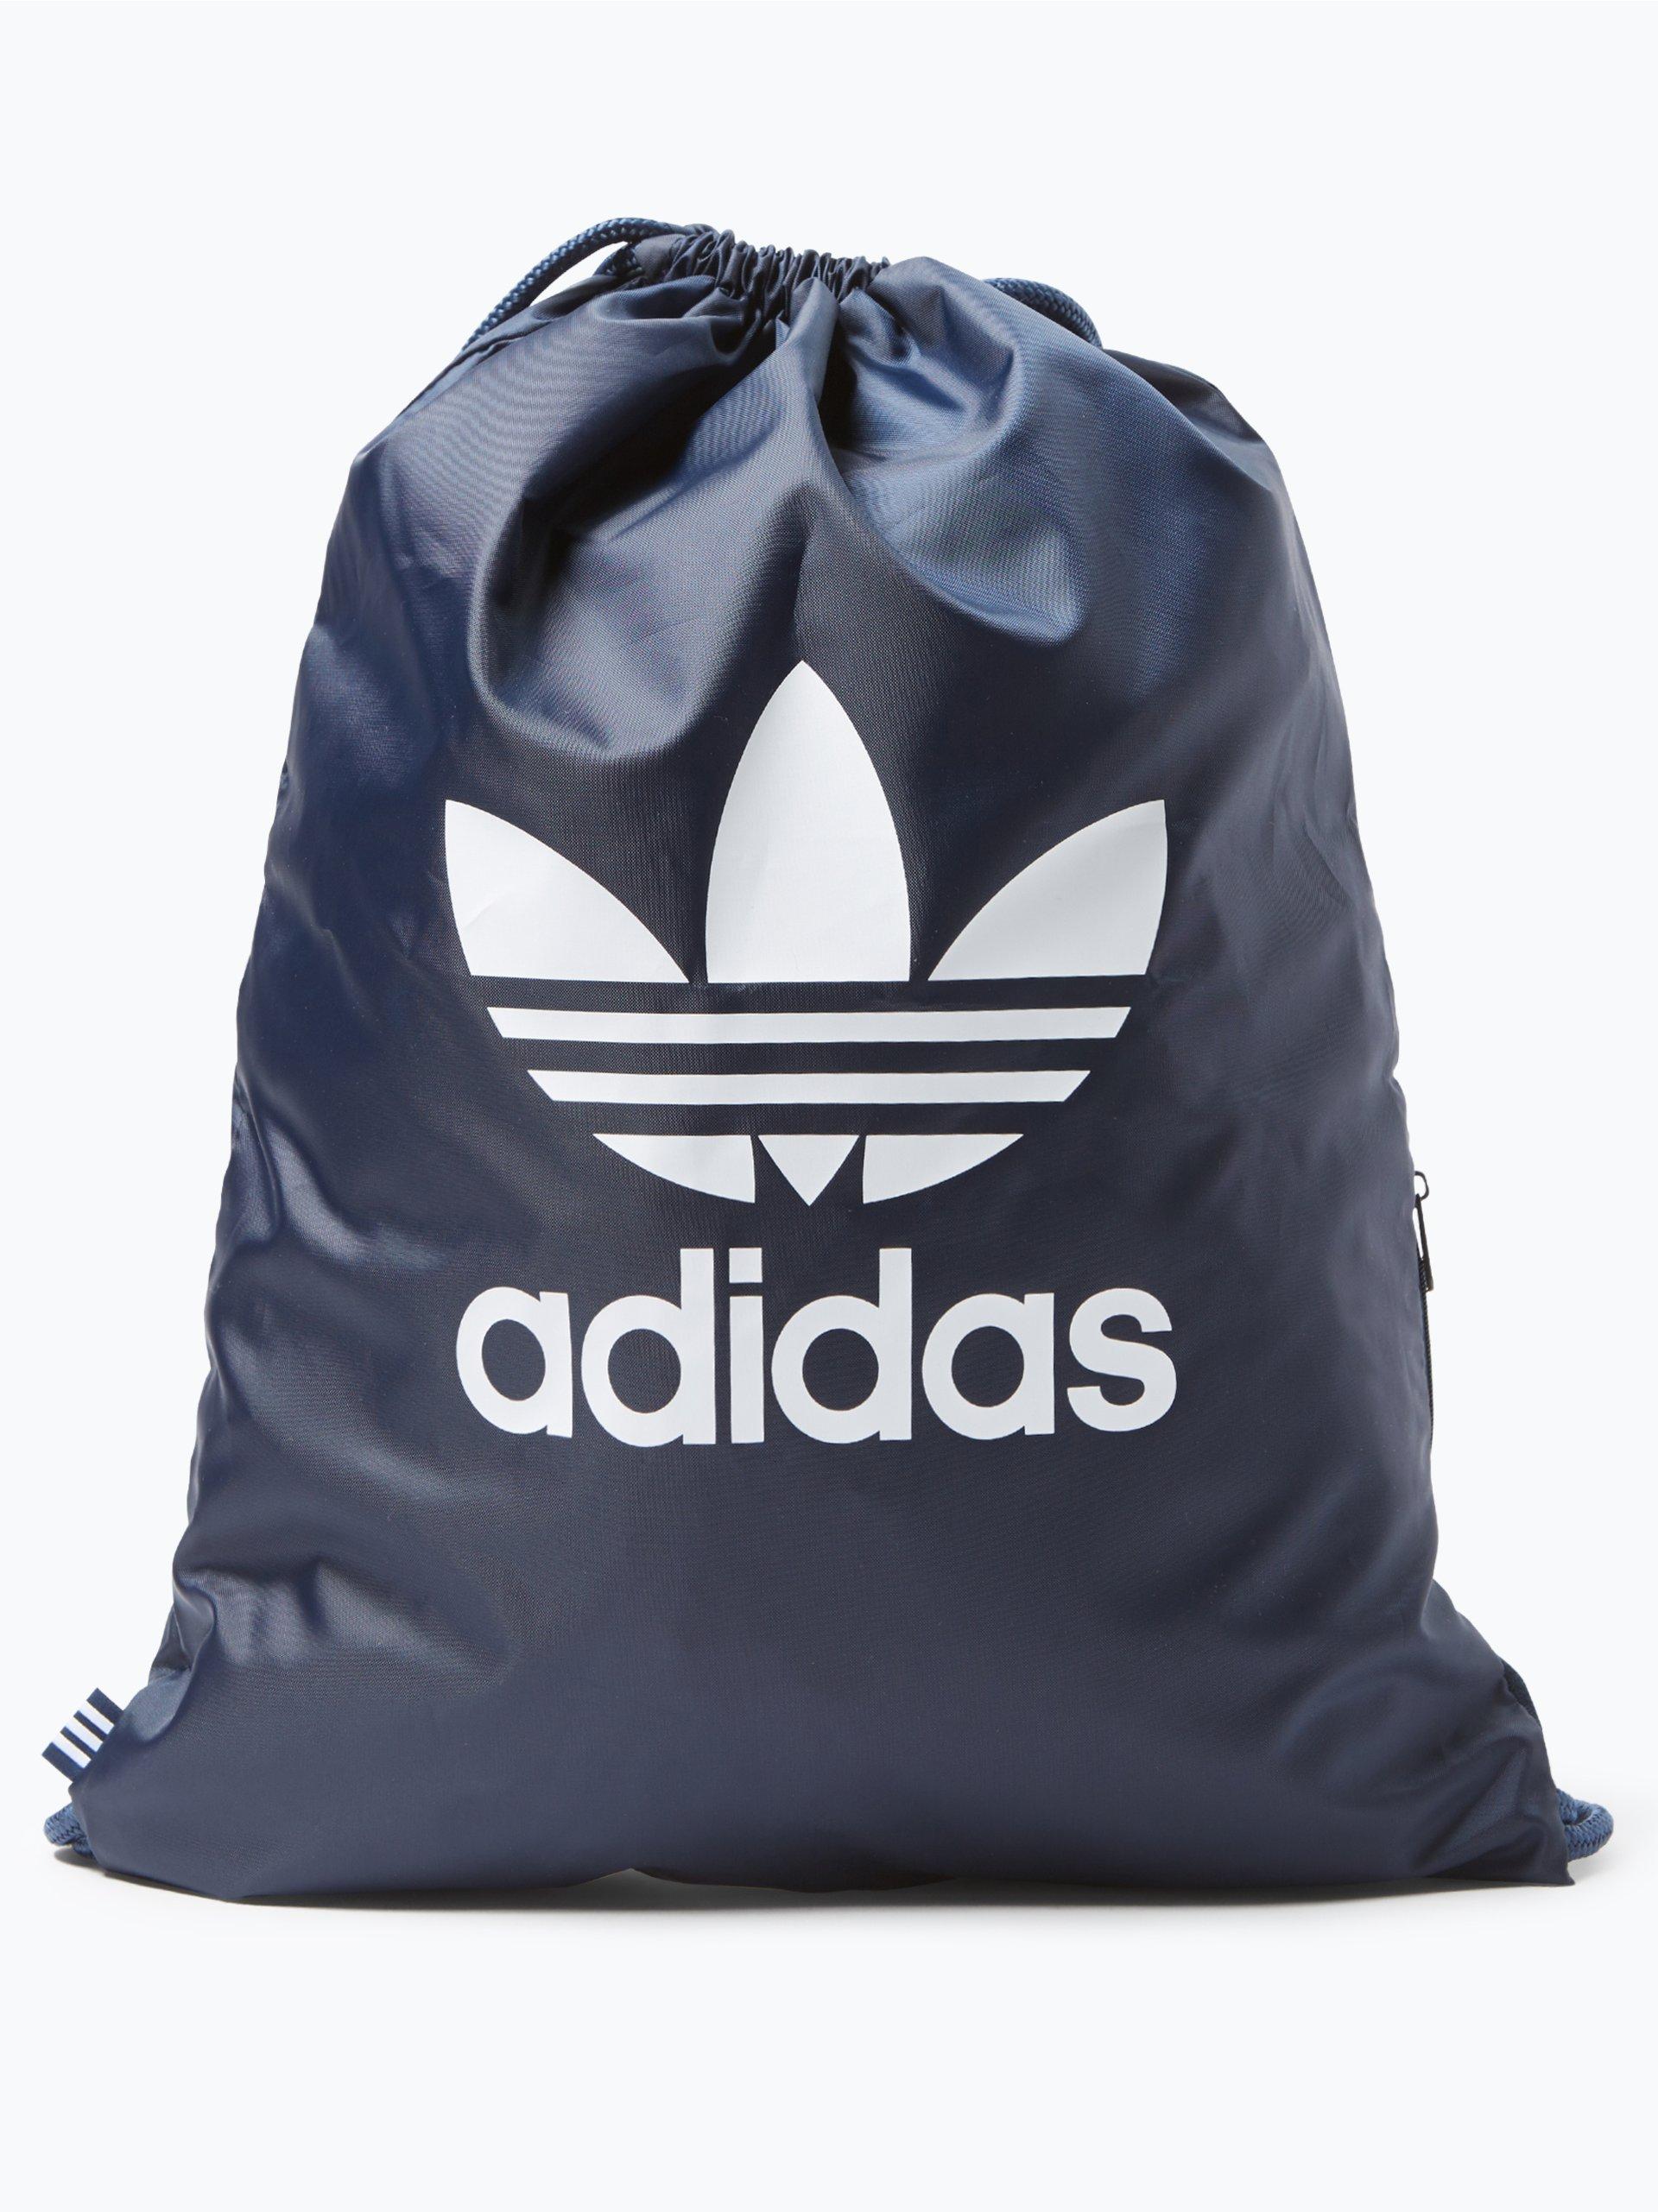 adidas Originals Herren Sportbeutel